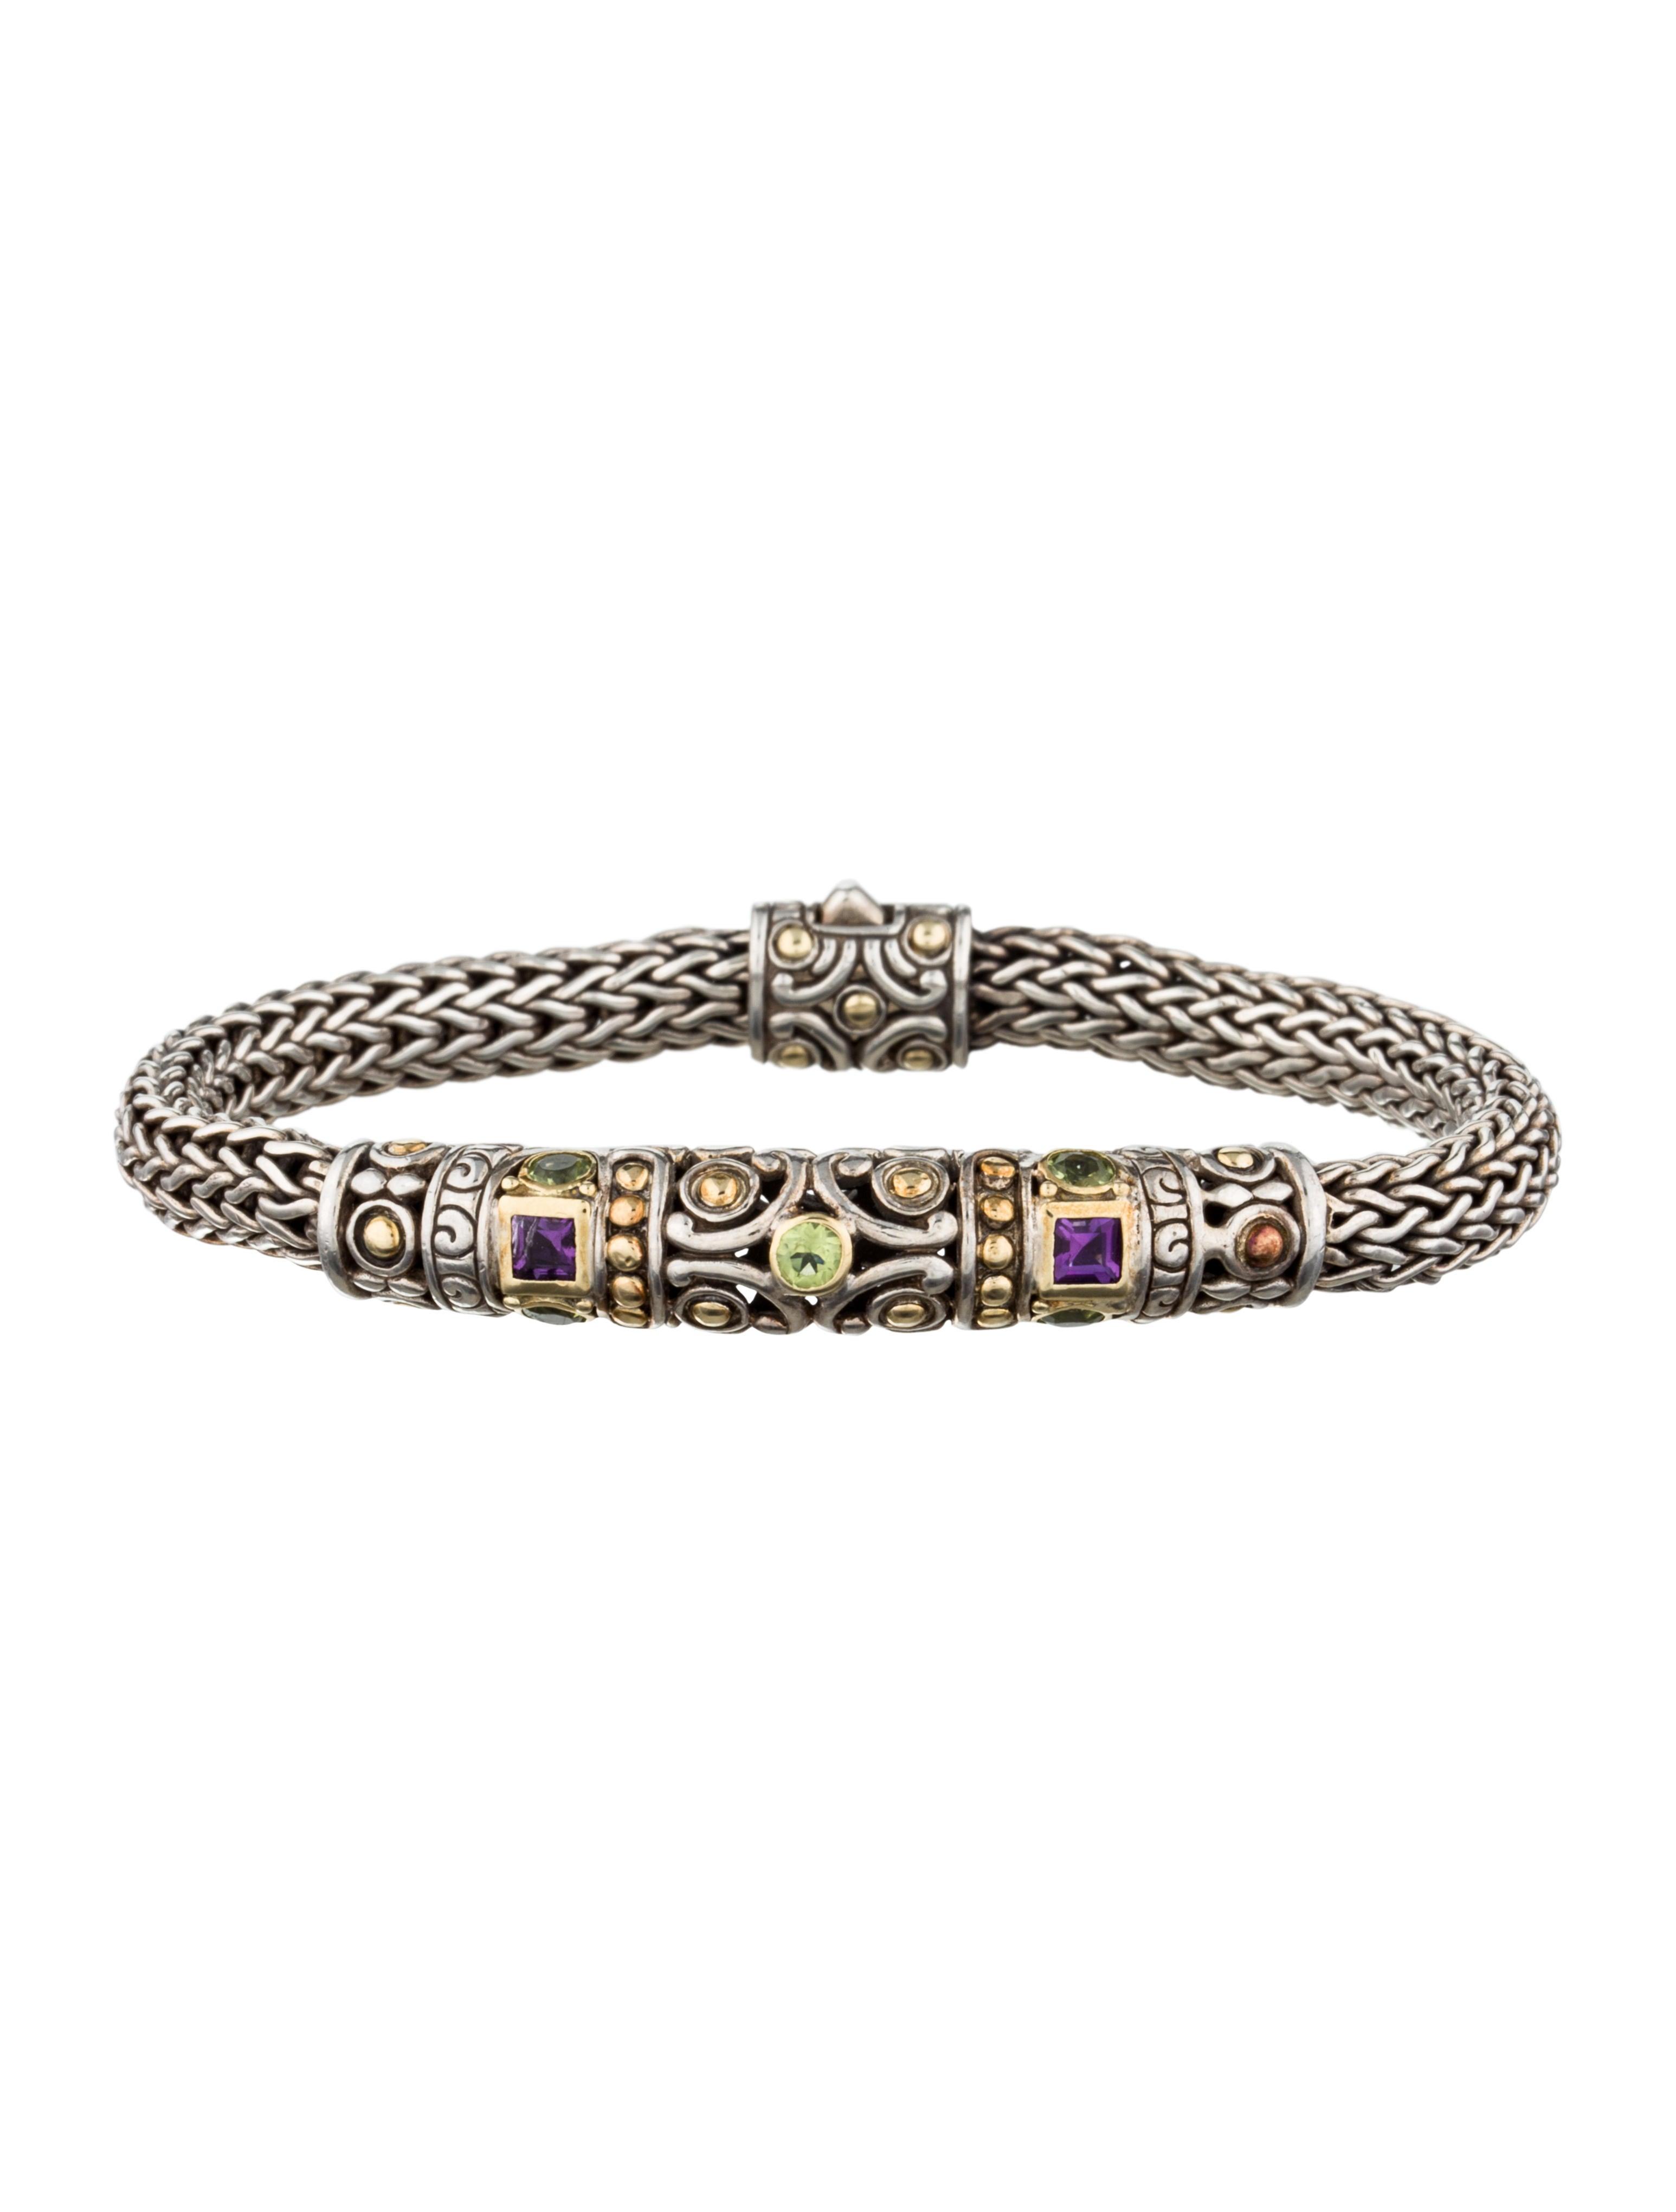 John Hardy Batu Chain Bracelet Jewelry Jha22573 The